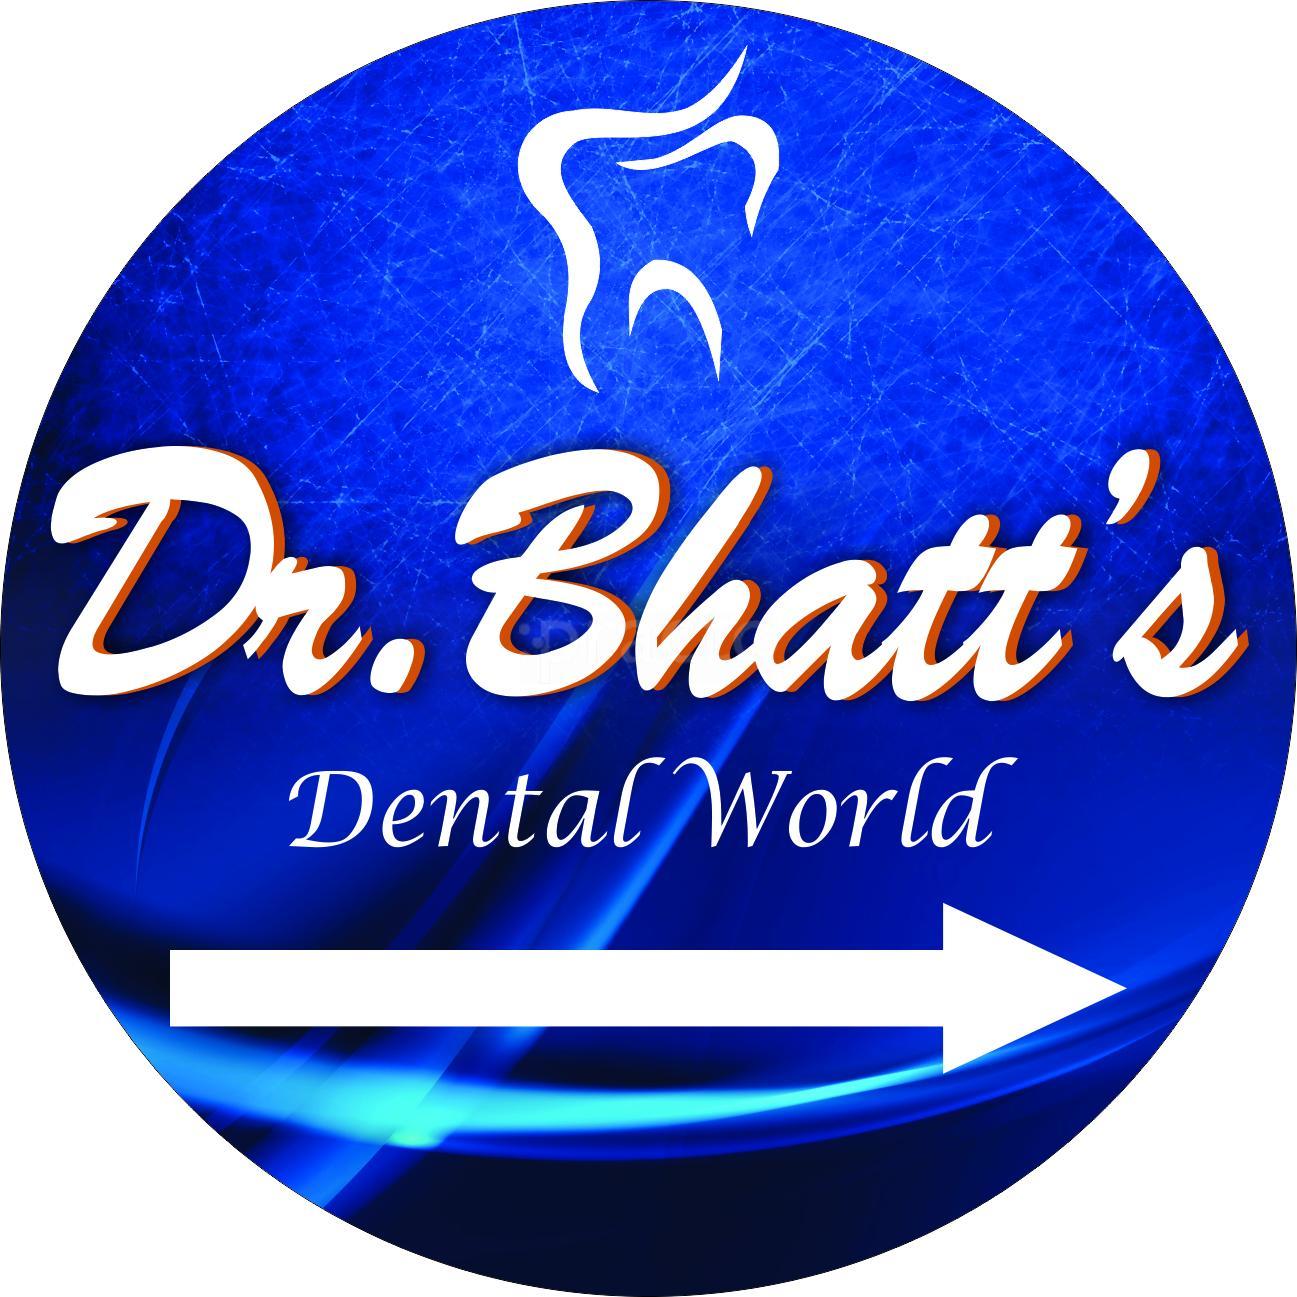 Dr. Bhatt's Dental World